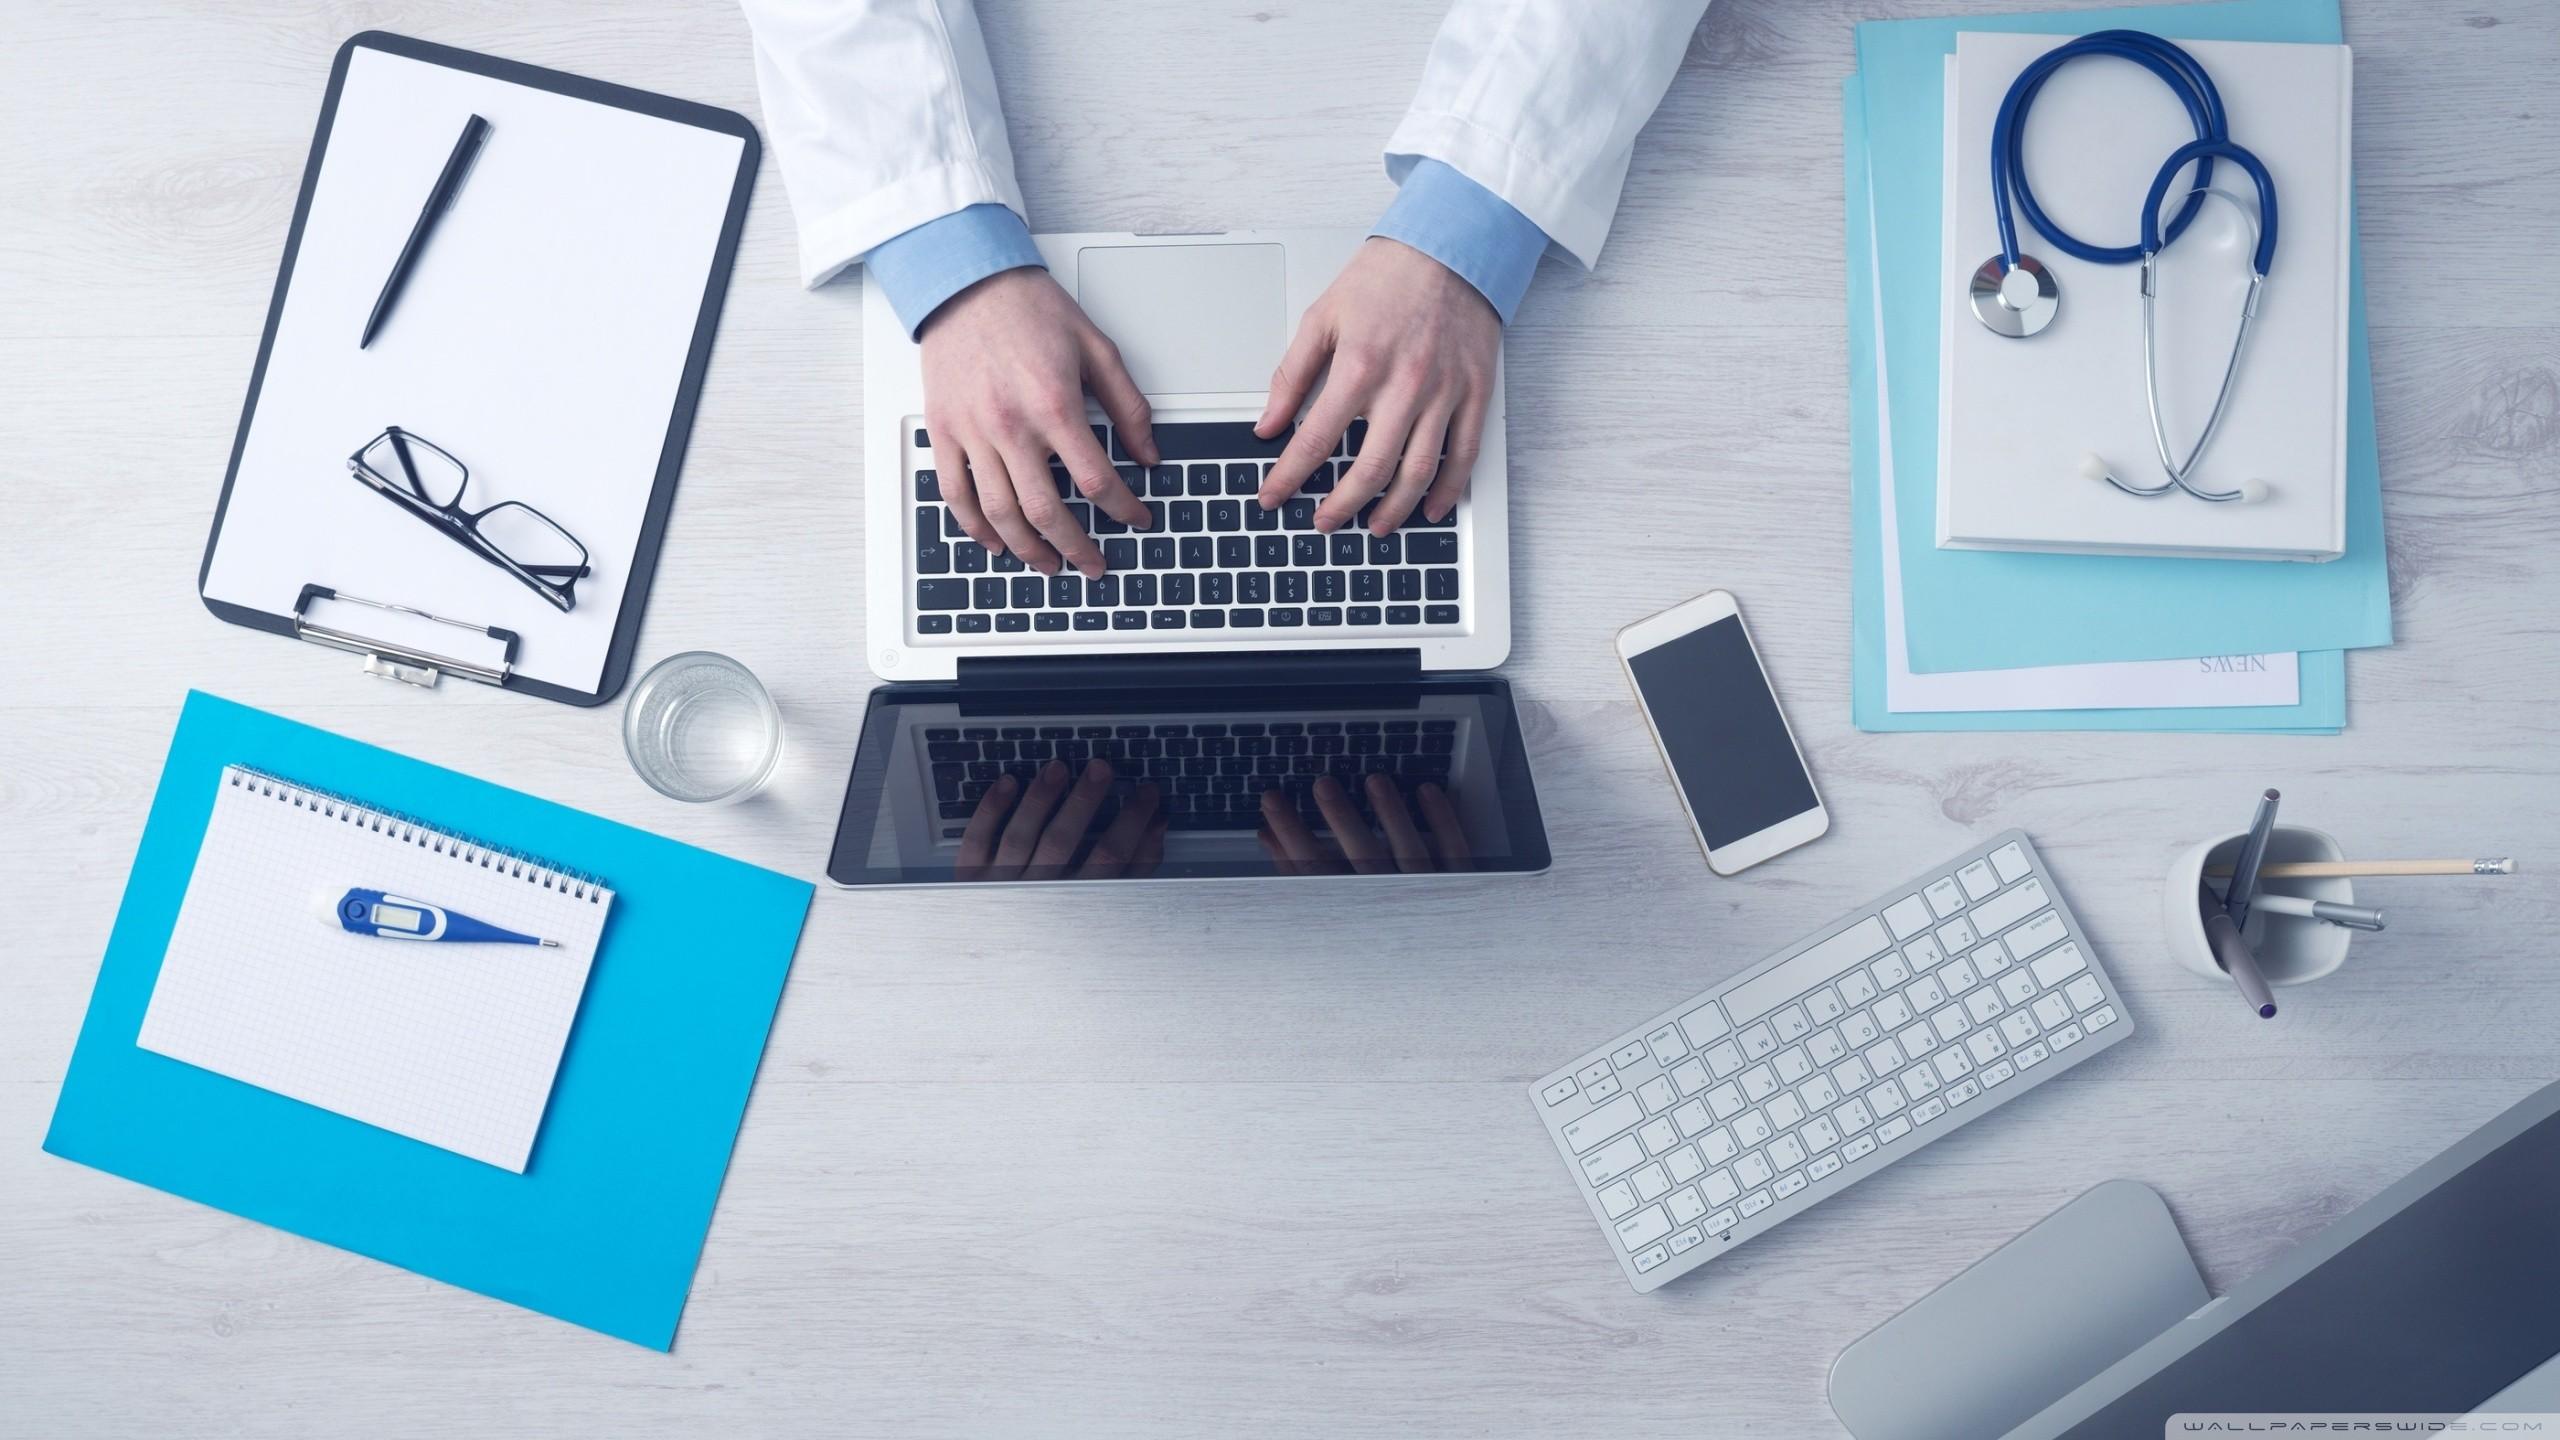 Doctor Office HD Wide Wallpaper for Widescreen